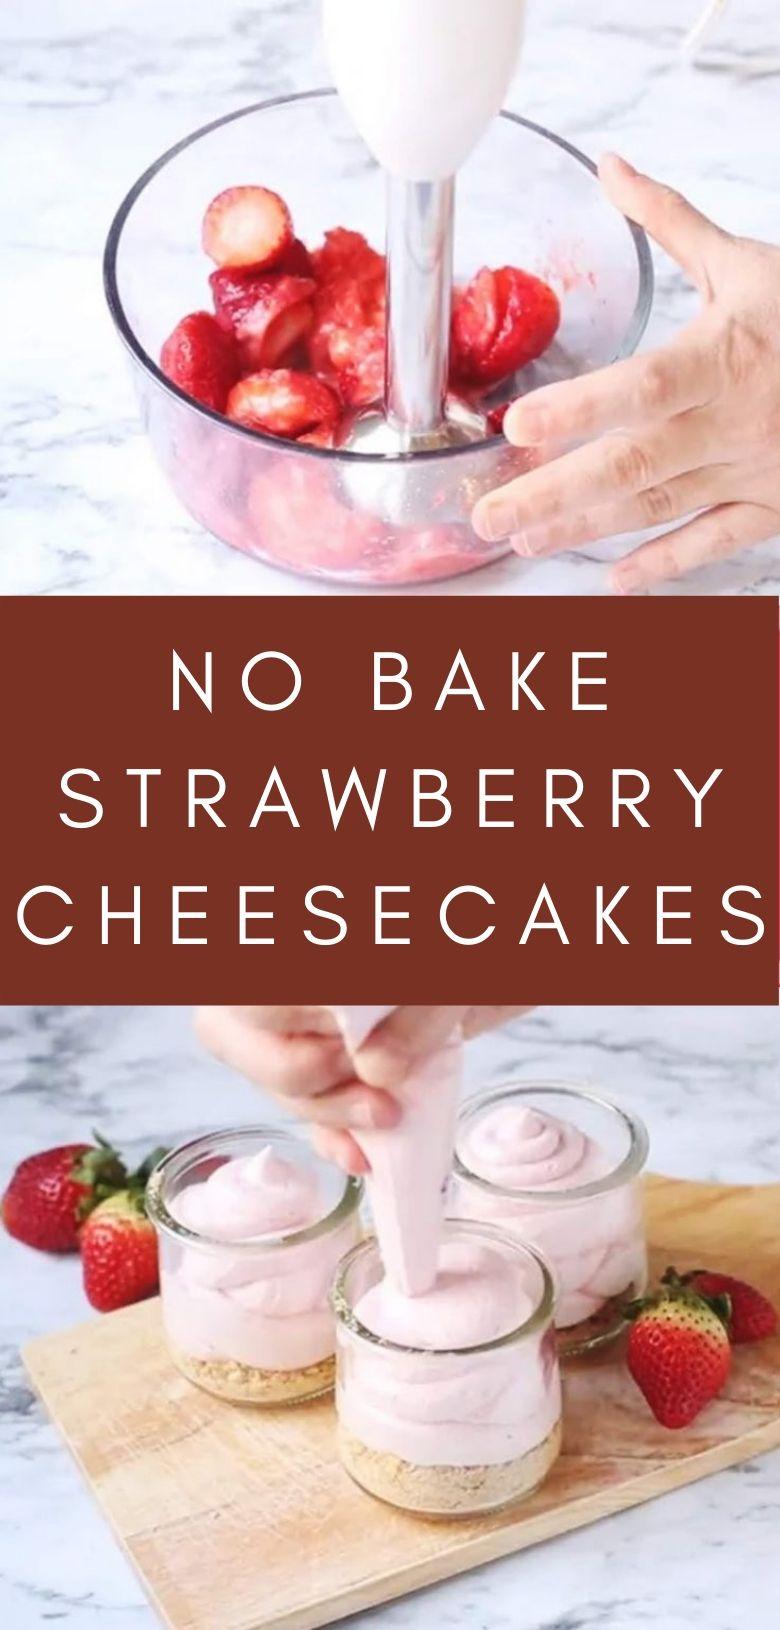 No Bake Strawberry Cheesecakes